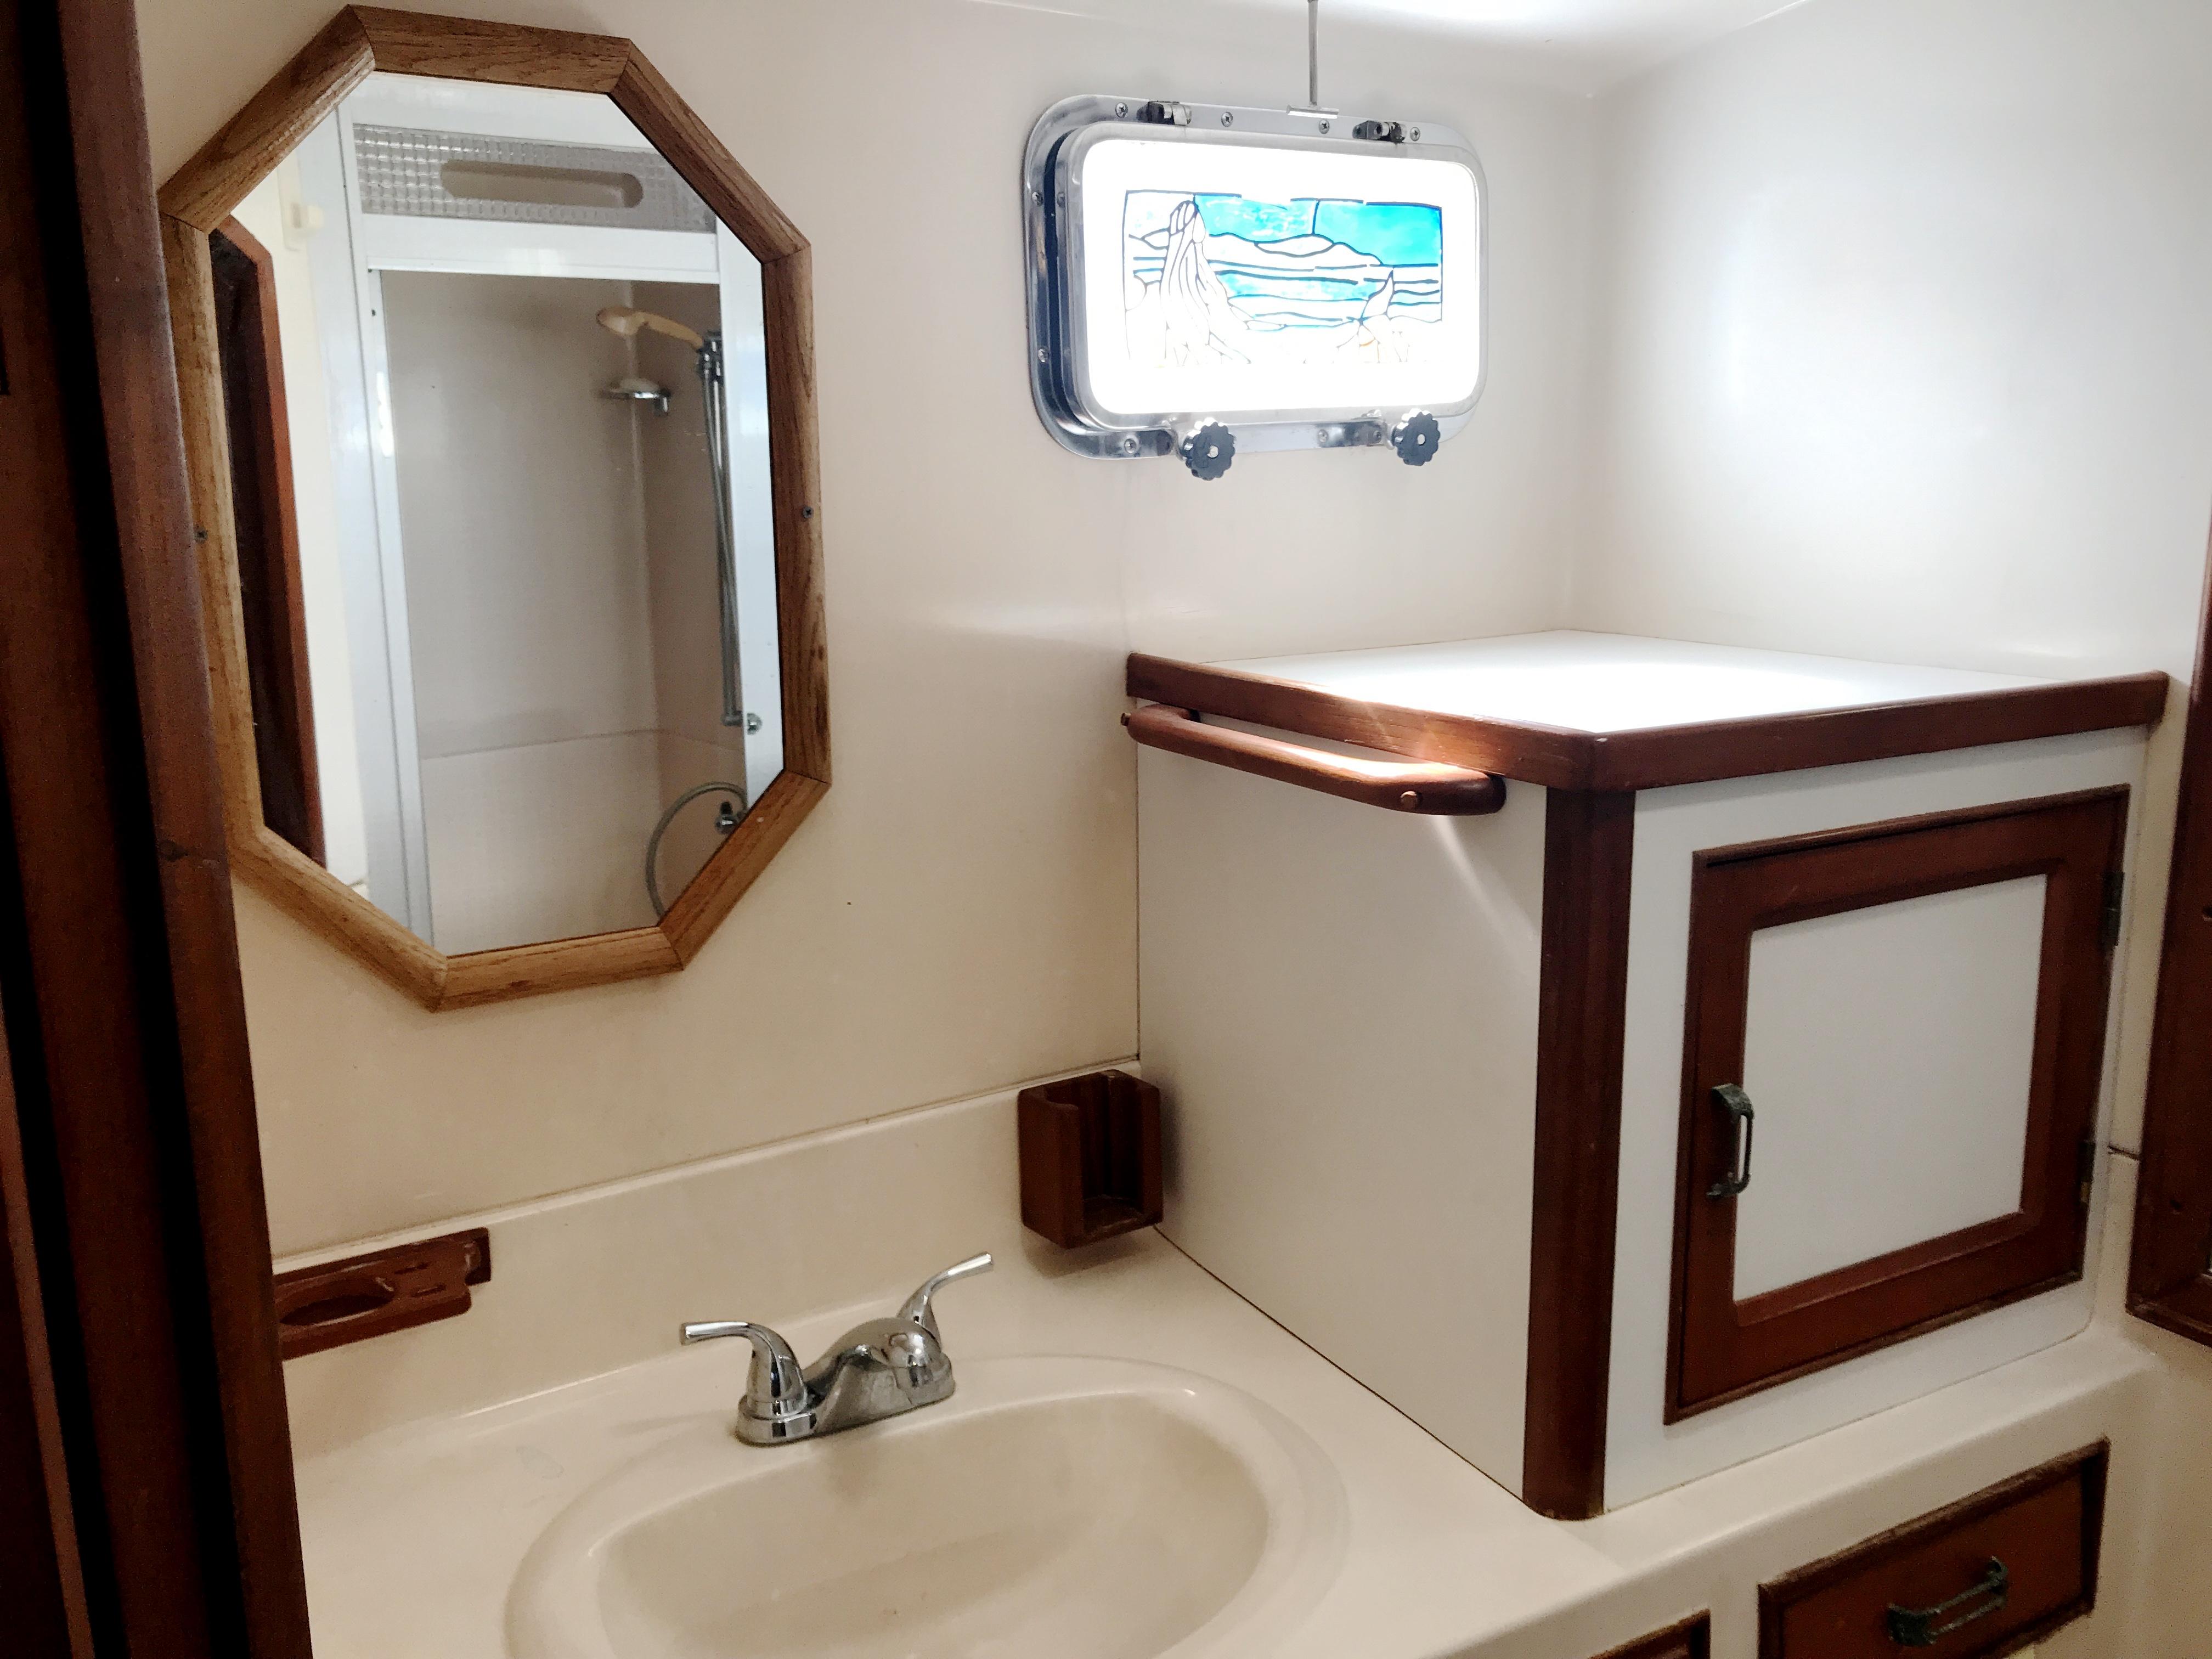 Sea Ranger SUNDECK - Master stateroom ensuite with sink, commode, shower